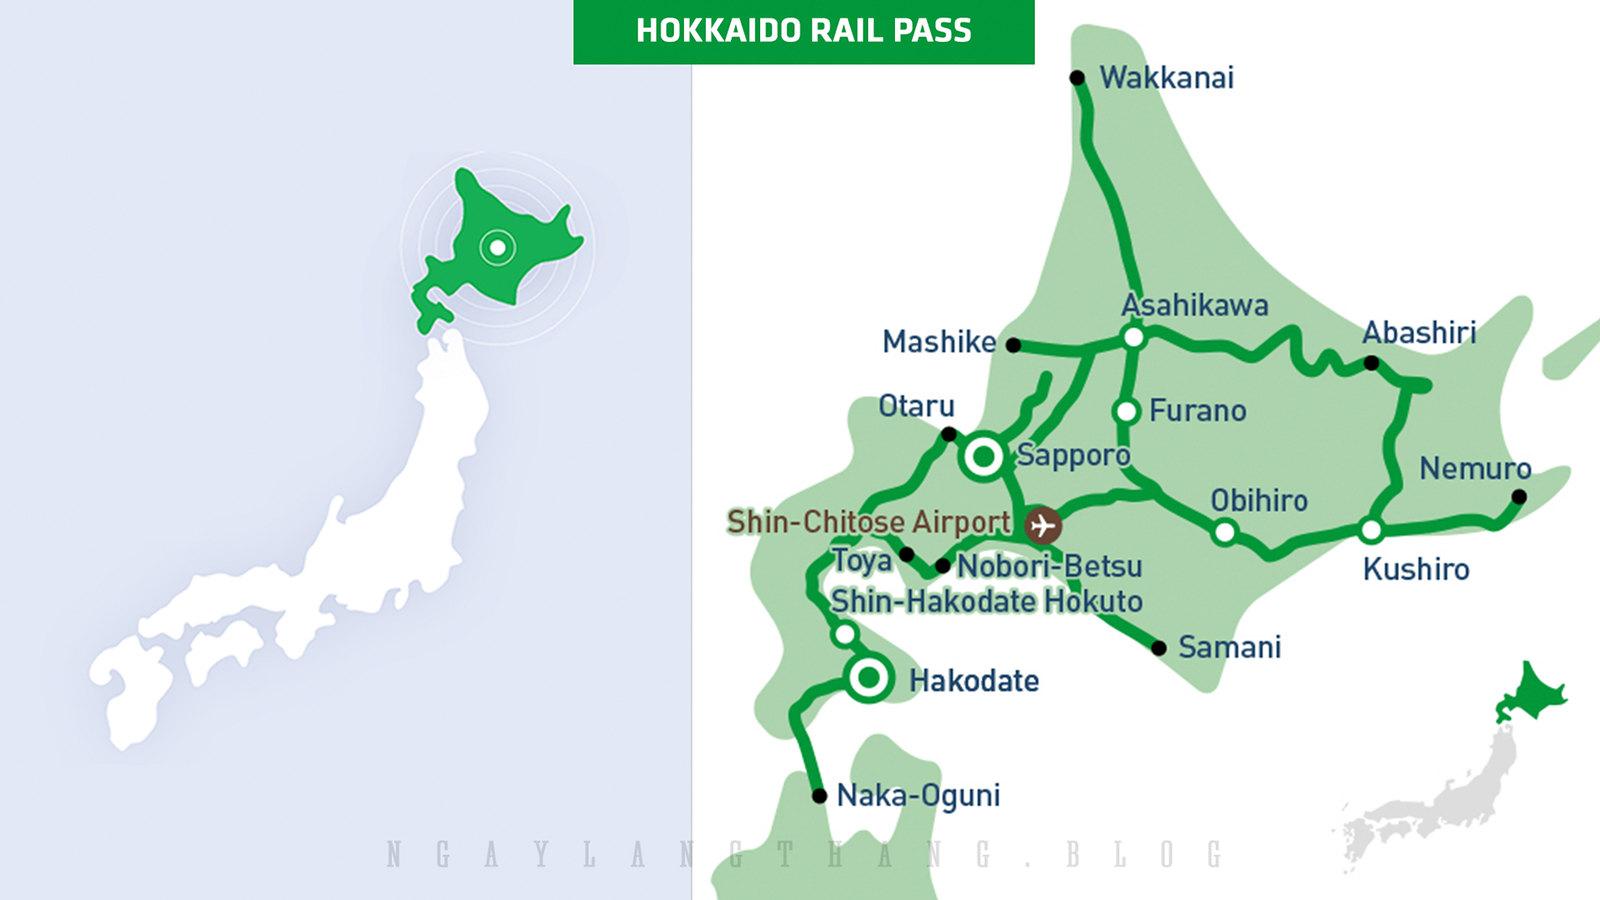 JR Pass ở Hokkaido -ngaylangthang